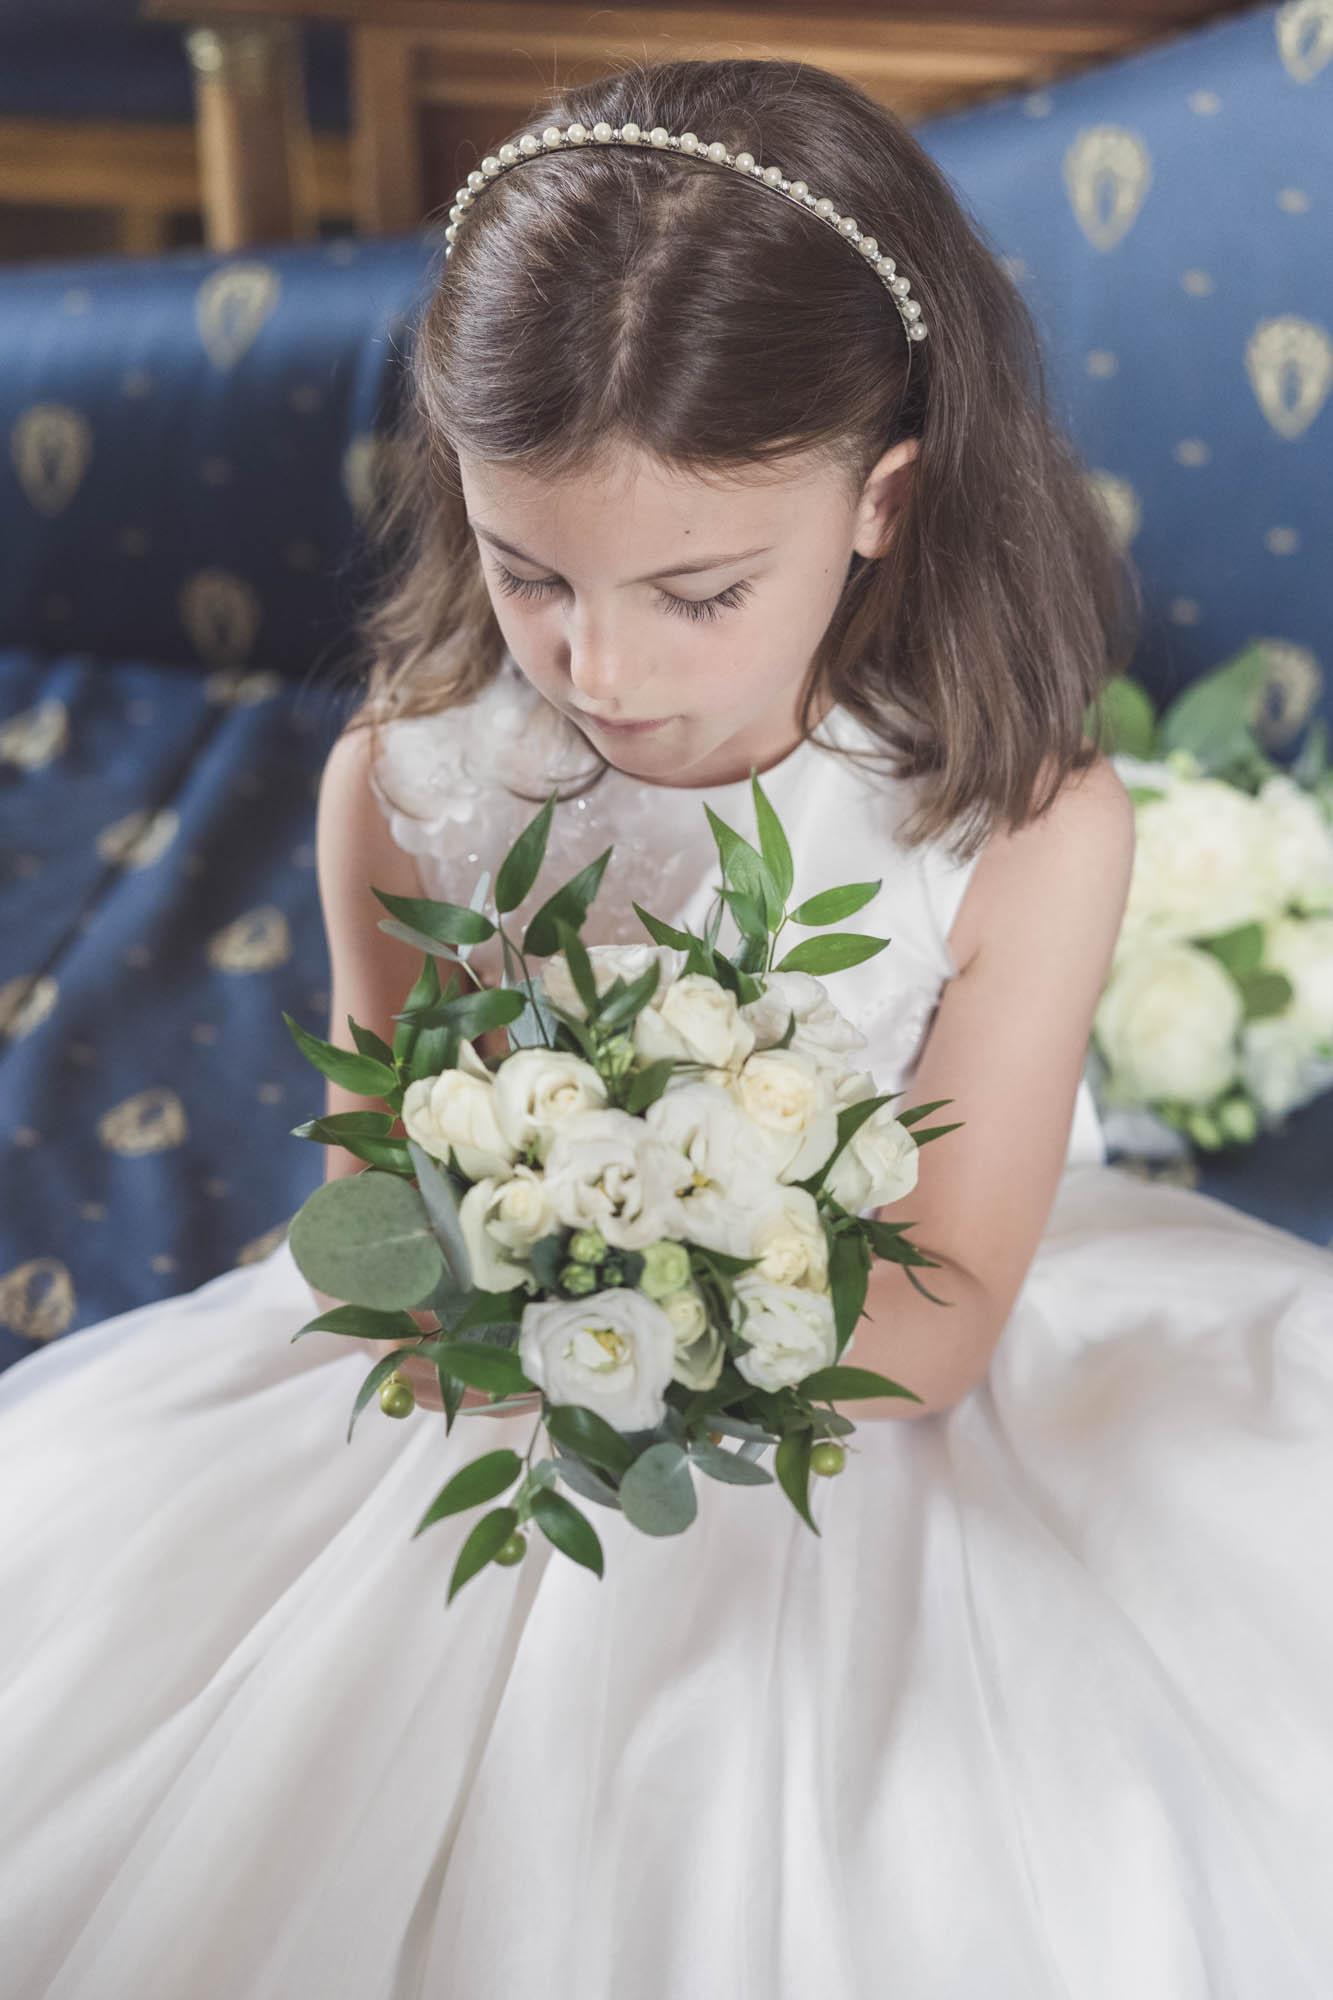 wedding pictures-59.jpg